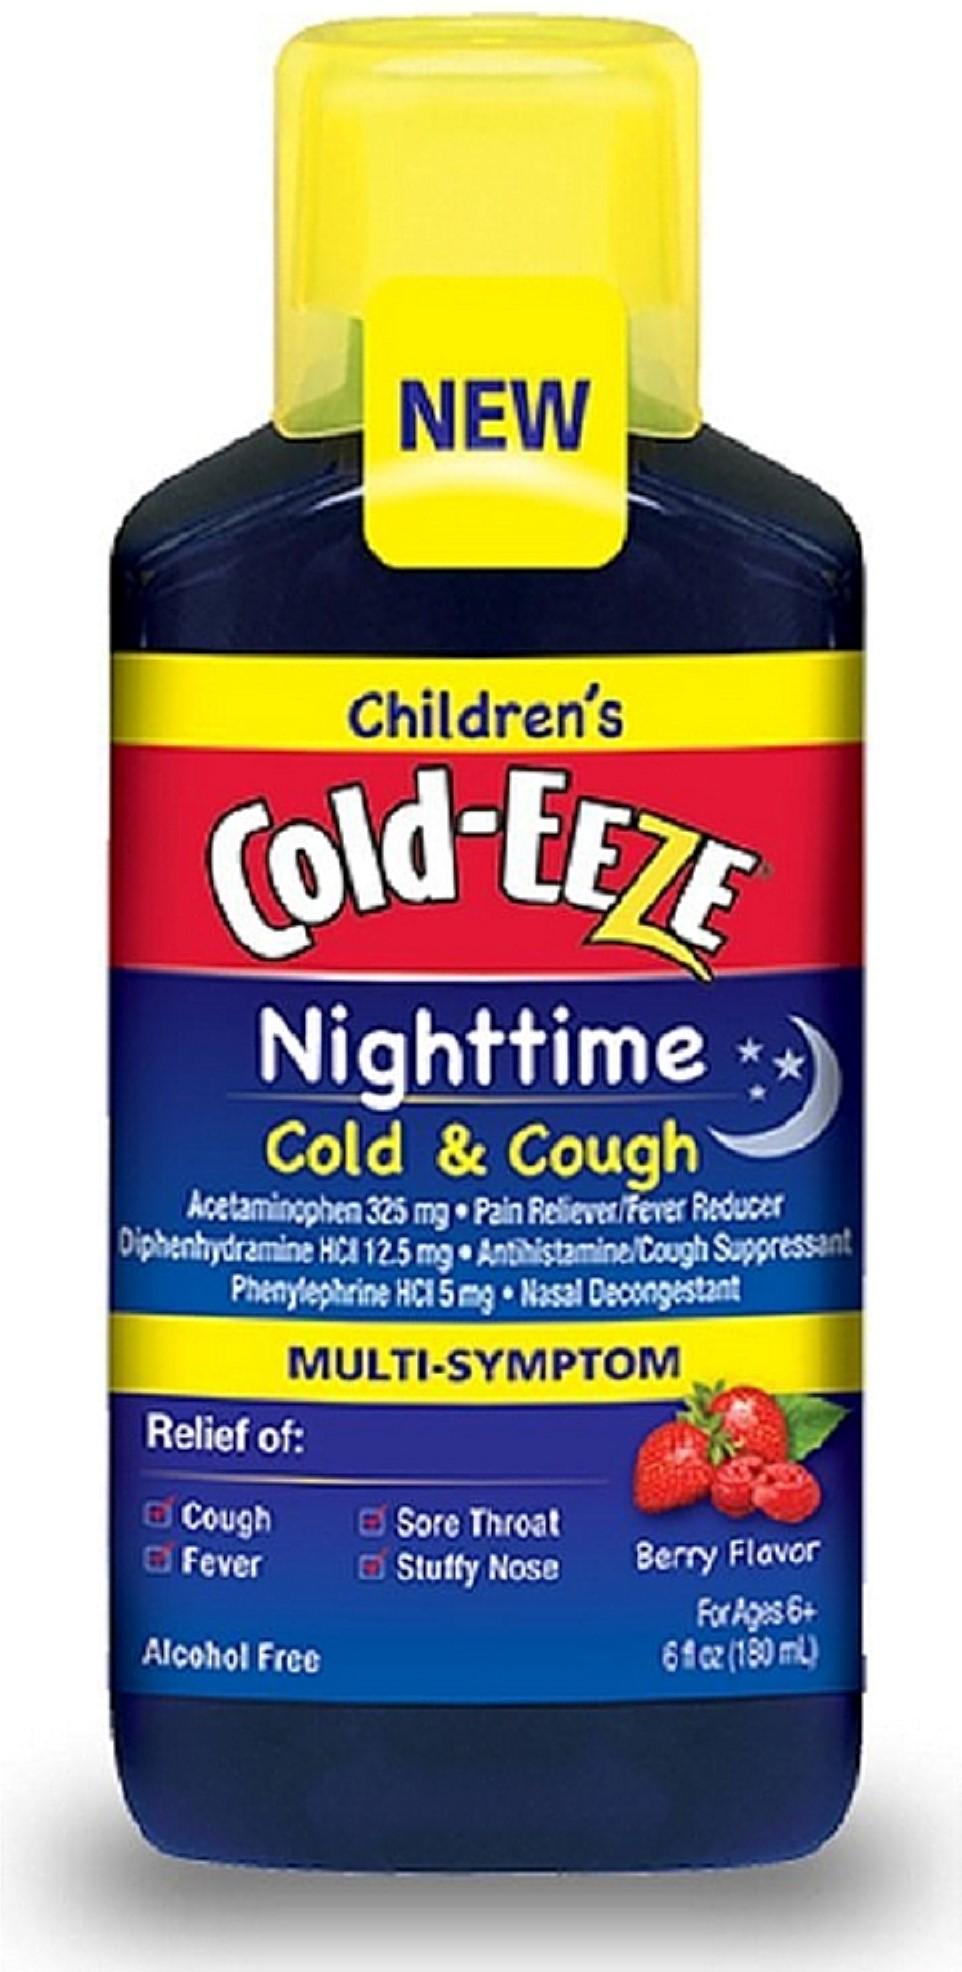 COLD-EEZE Children's Nighttime Cold & Cough Multi-Symptom ...